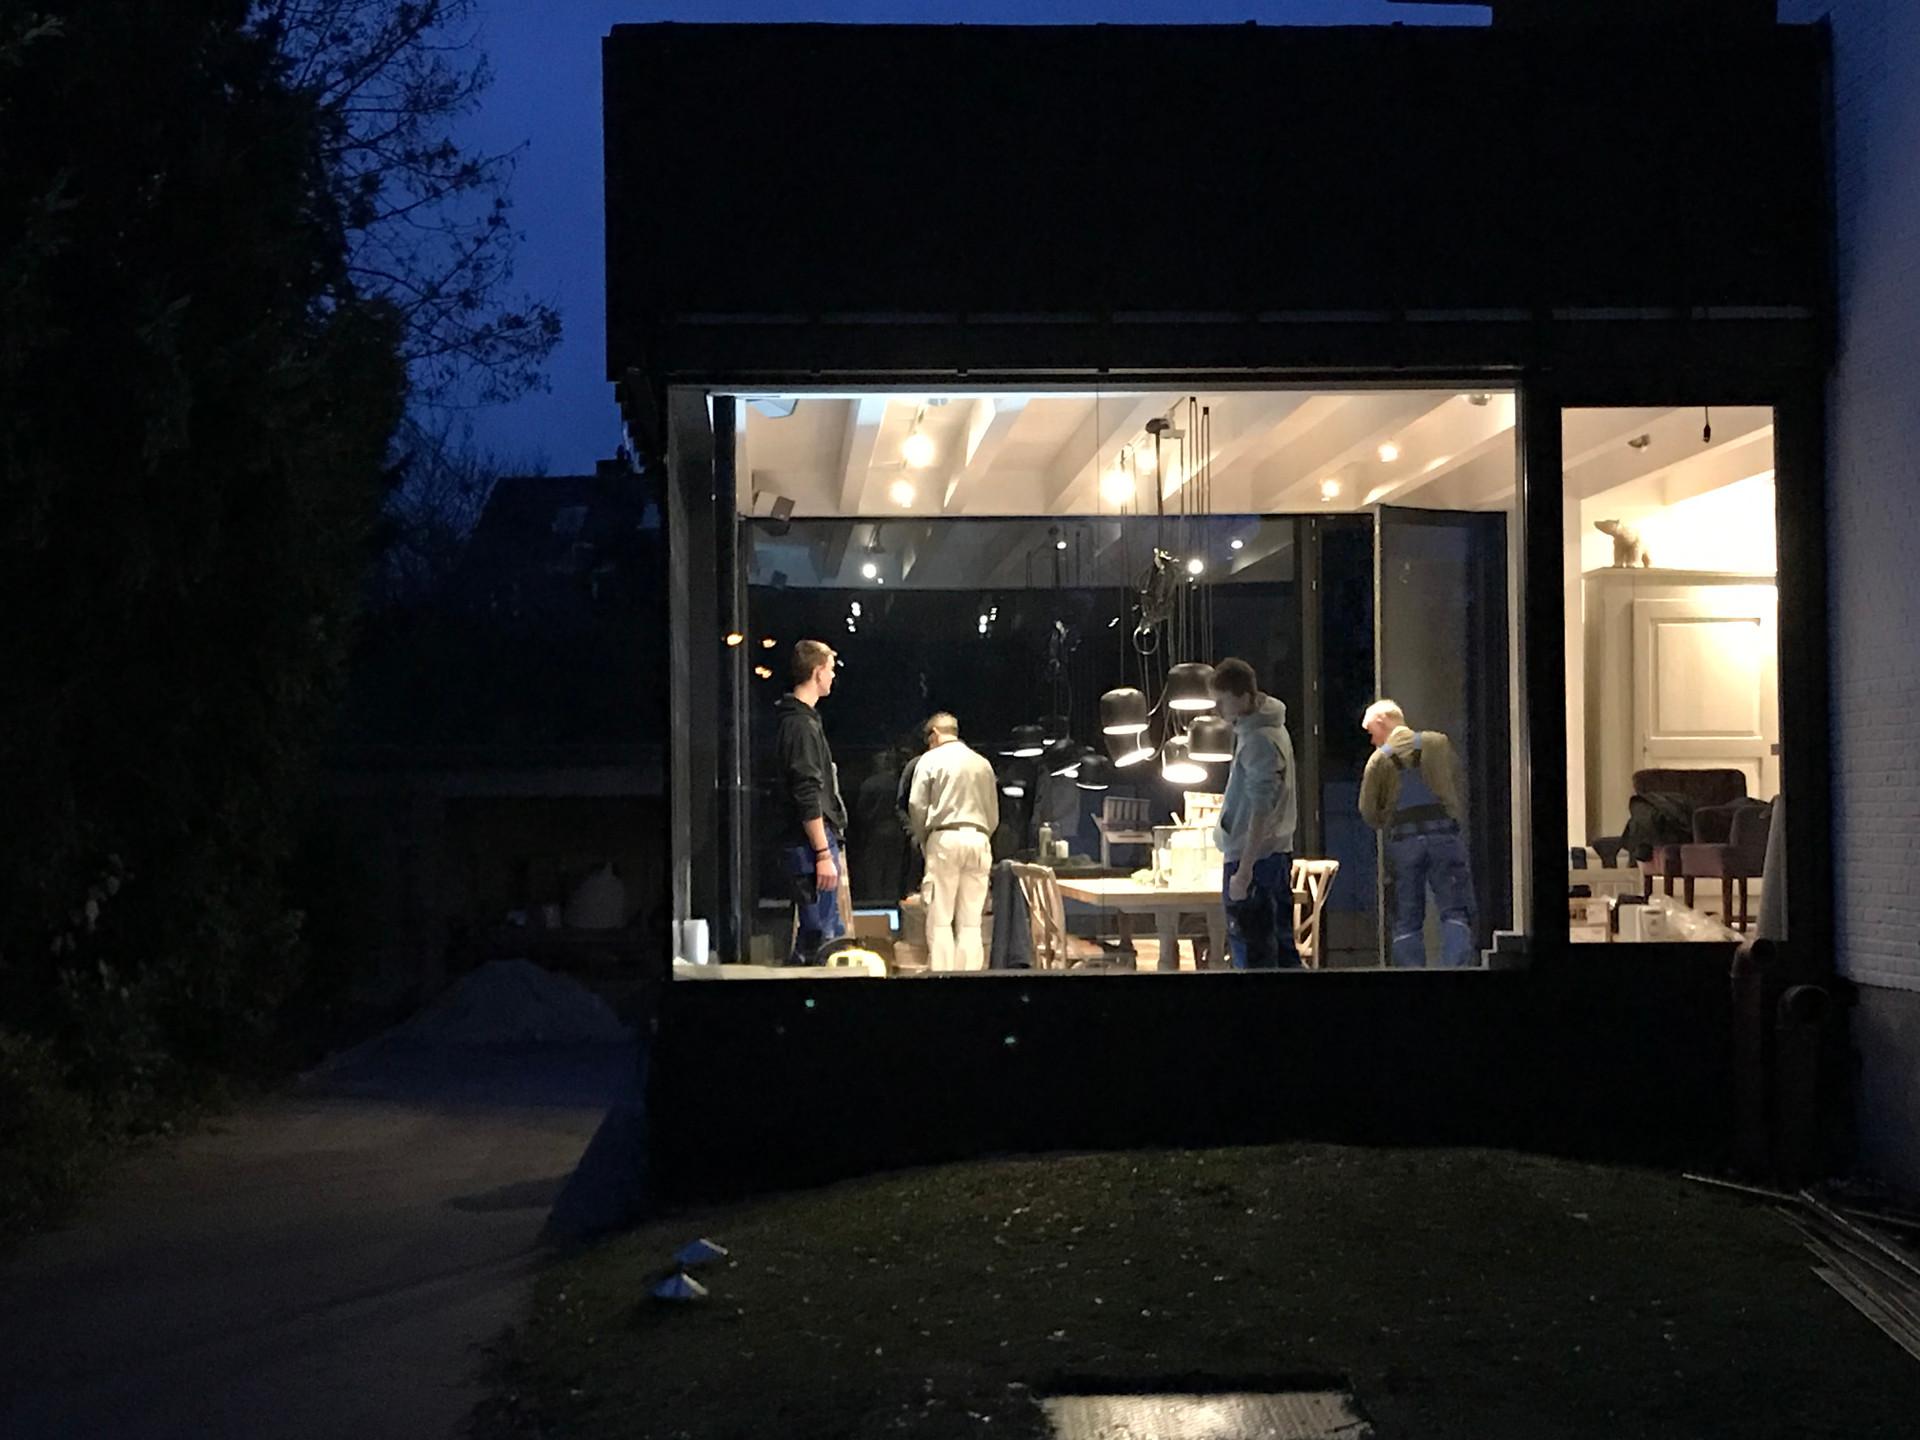 N( construction at night